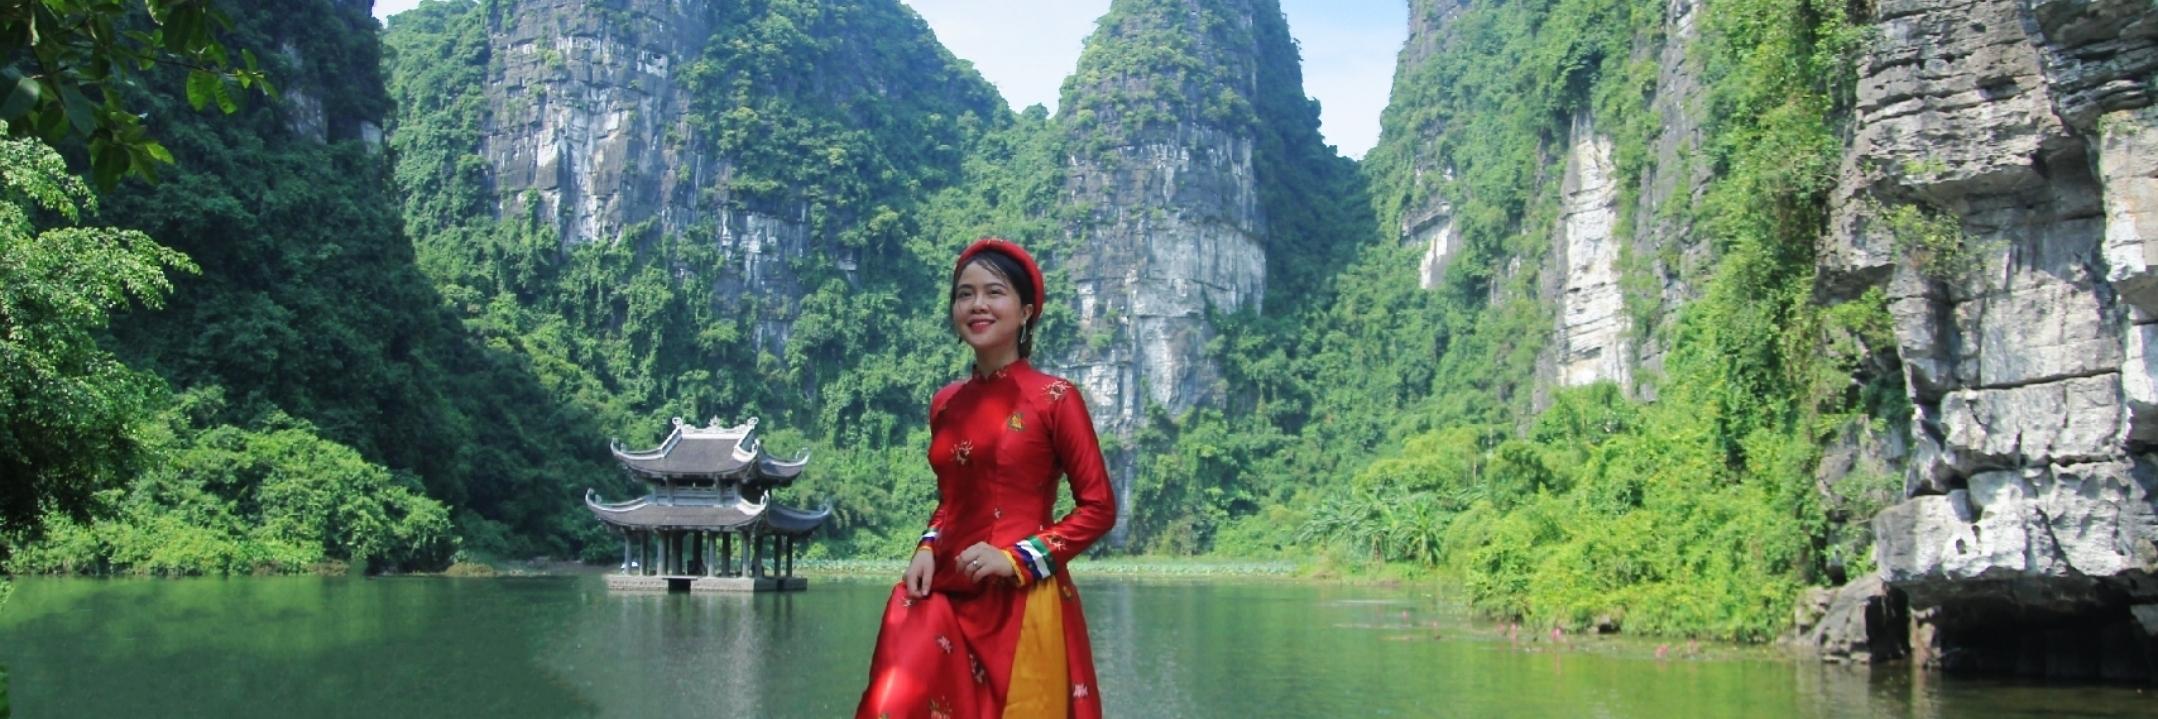 https://gody.vn/blog/huongduong73988813/post/review-mot-ngay-tai-ninh-binh-5027